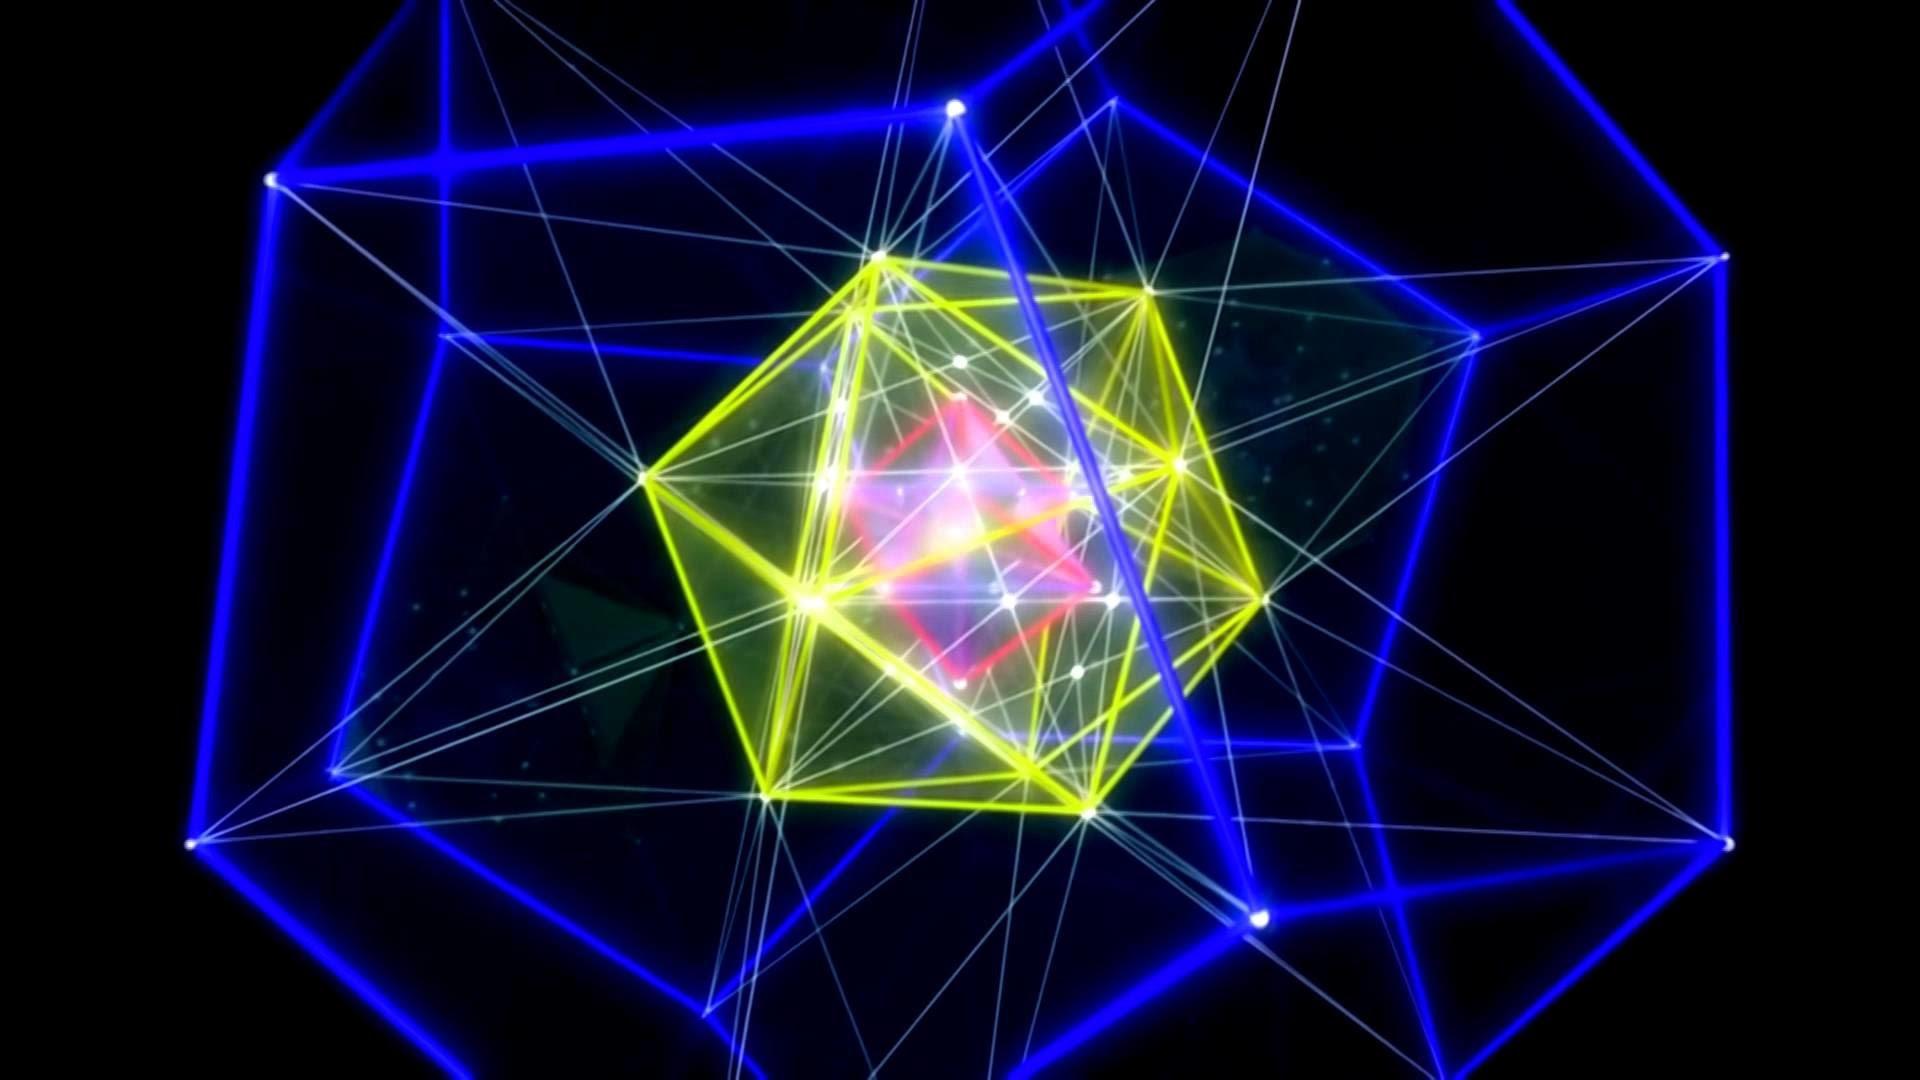 Metatrons Cube Wallpaper 48 Images